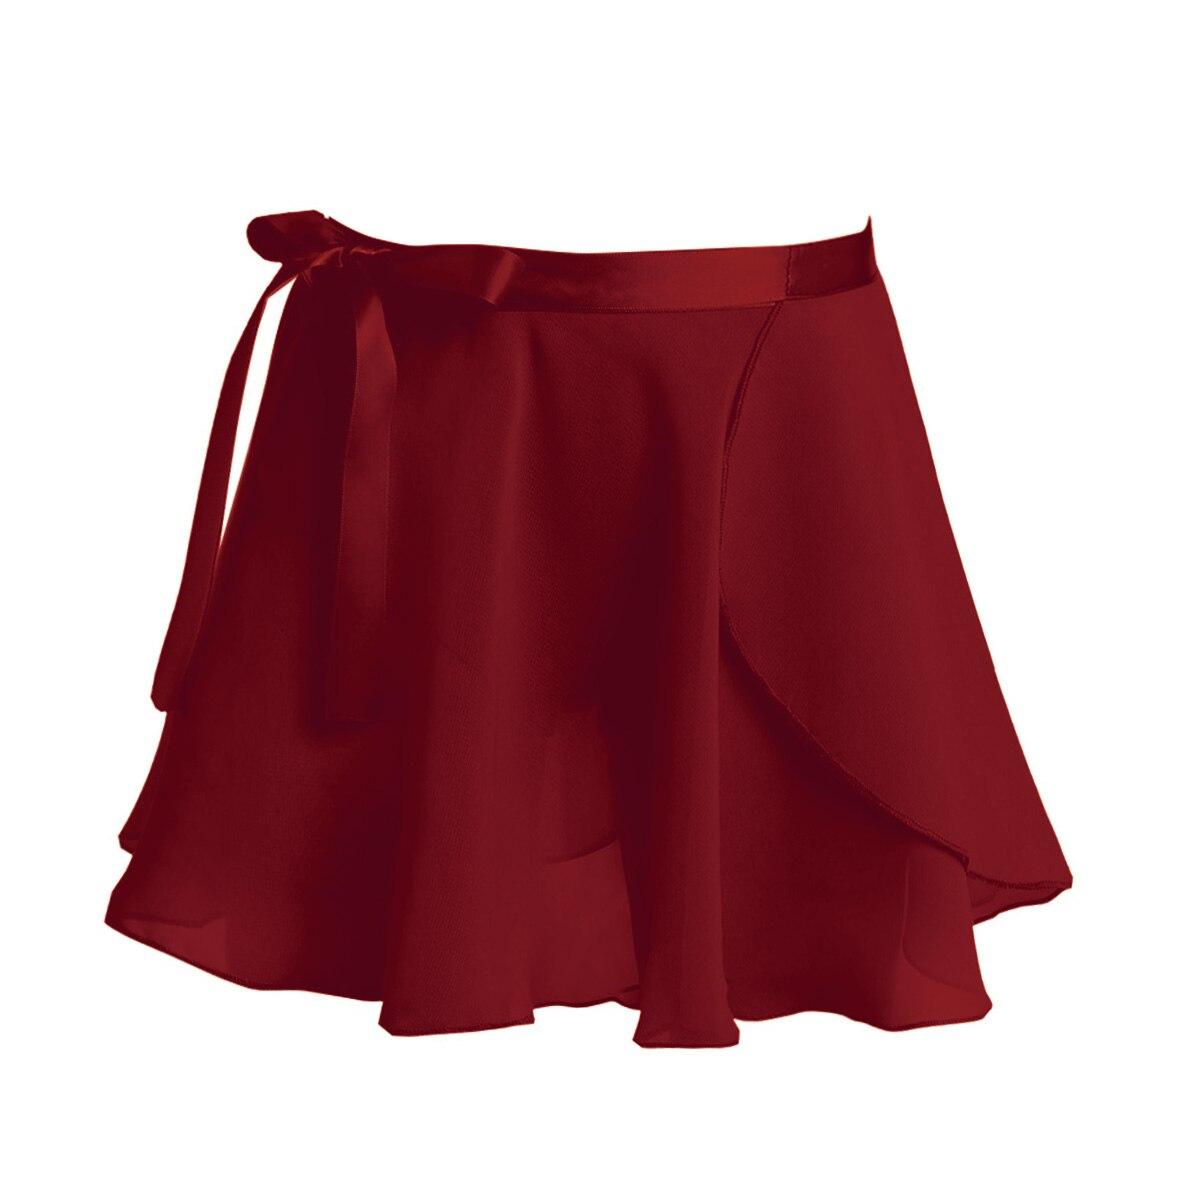 ropa-de-baile-para-ninos-minifaldas-basicas-de-gasa-con-lazo-en-la-cintura-para-ninas-ballet-leotardo-baile-latino-practica-de-baile